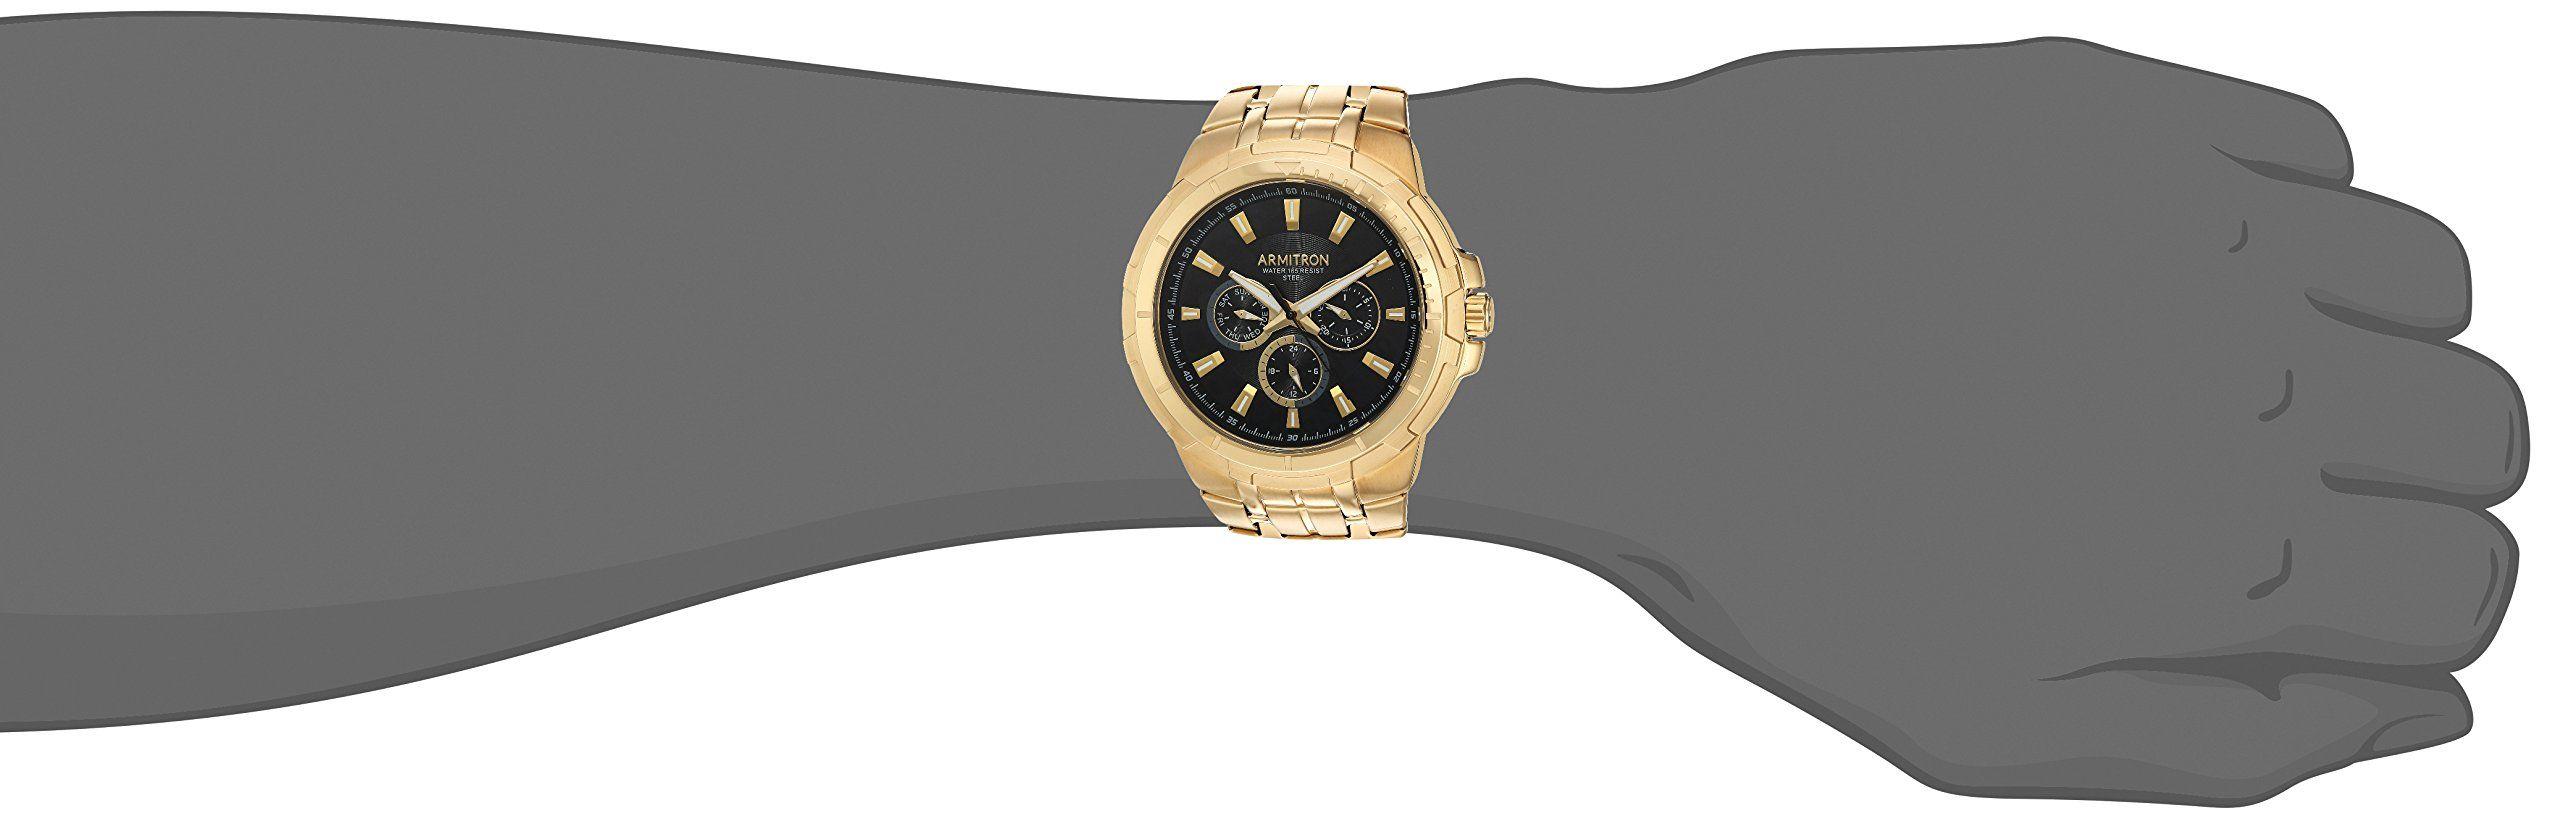 Mens 205144bkgp Multifunction Bracelet Armitron Goldtone Watch Dial 8wPk0On